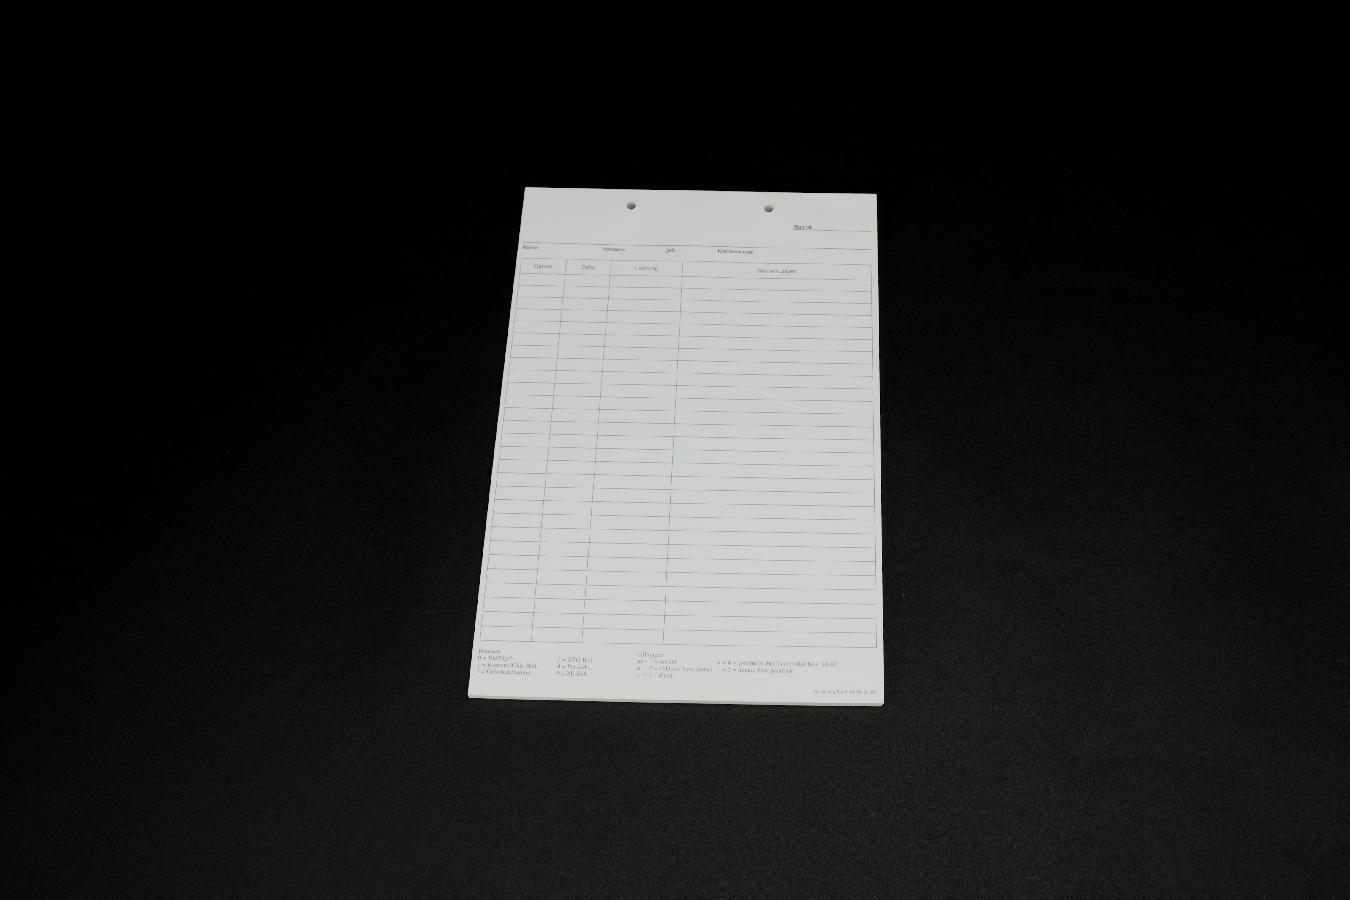 Krankenblatt N weiß kopfgel. 100 Stück